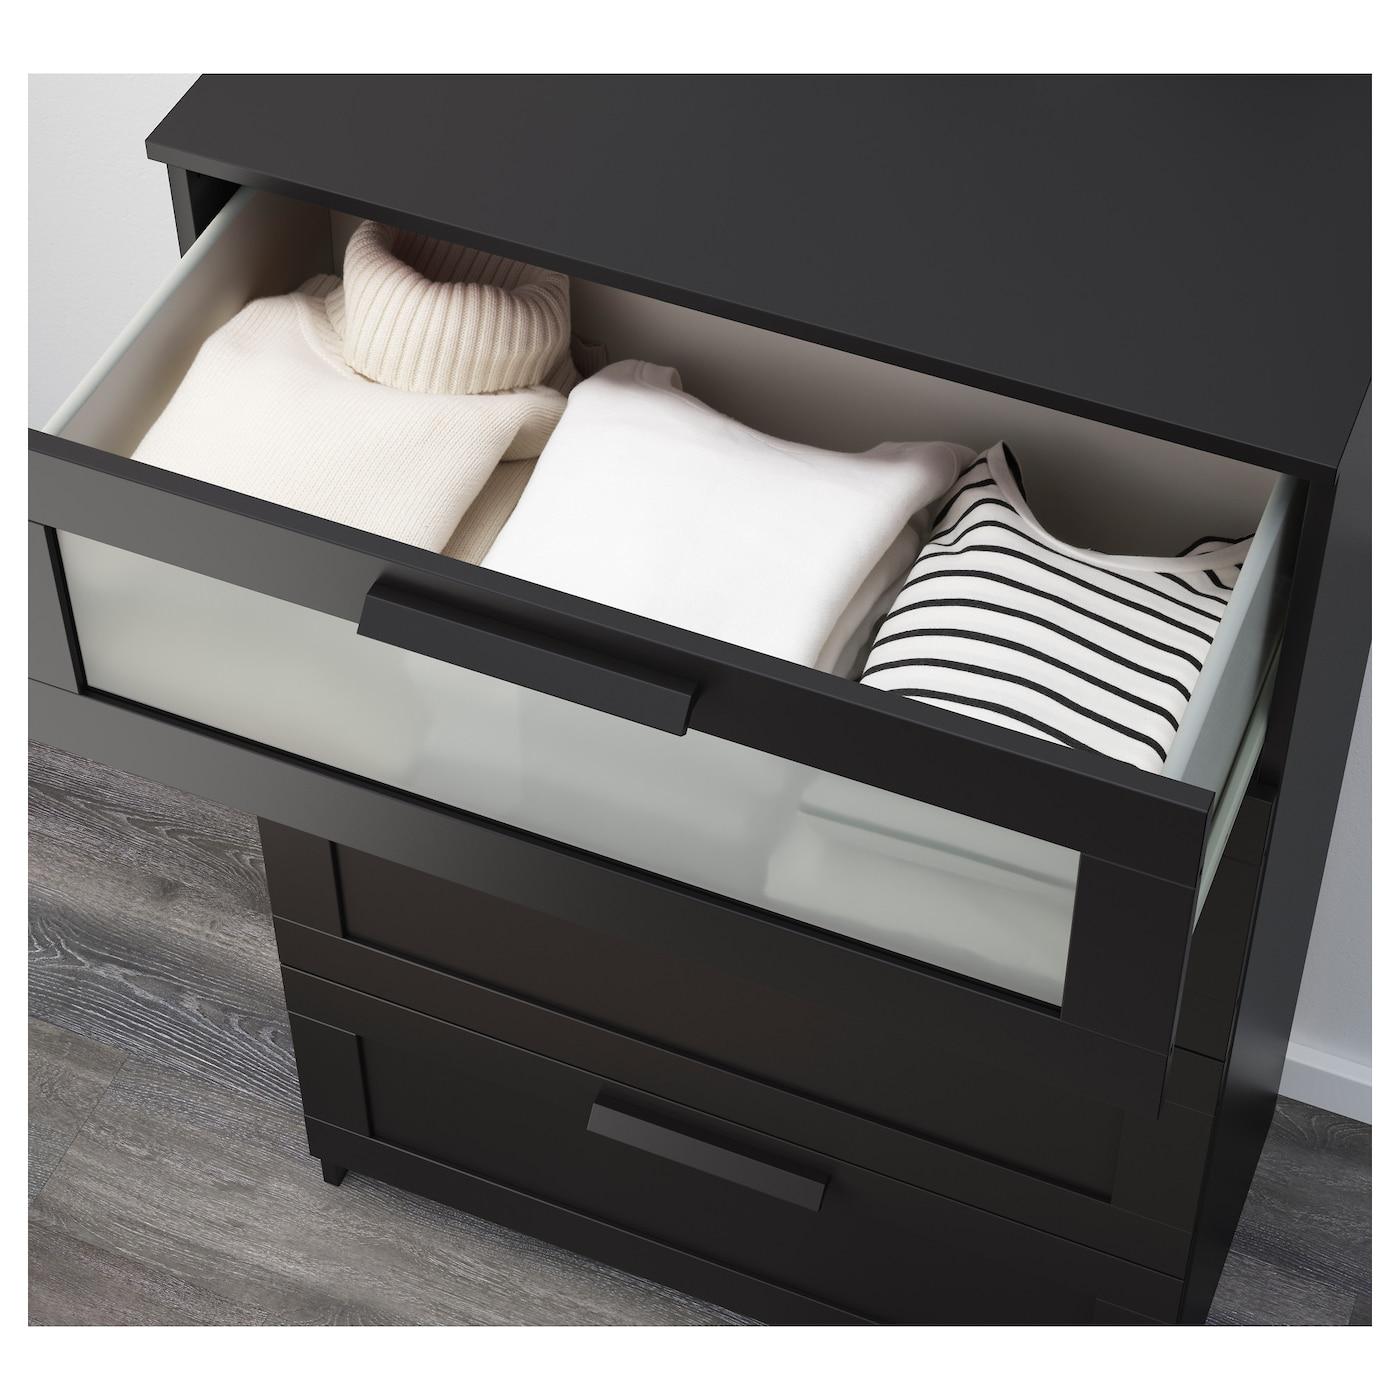 brimnes commode 4 tiroirs noir verre givr 78x124 cm ikea. Black Bedroom Furniture Sets. Home Design Ideas